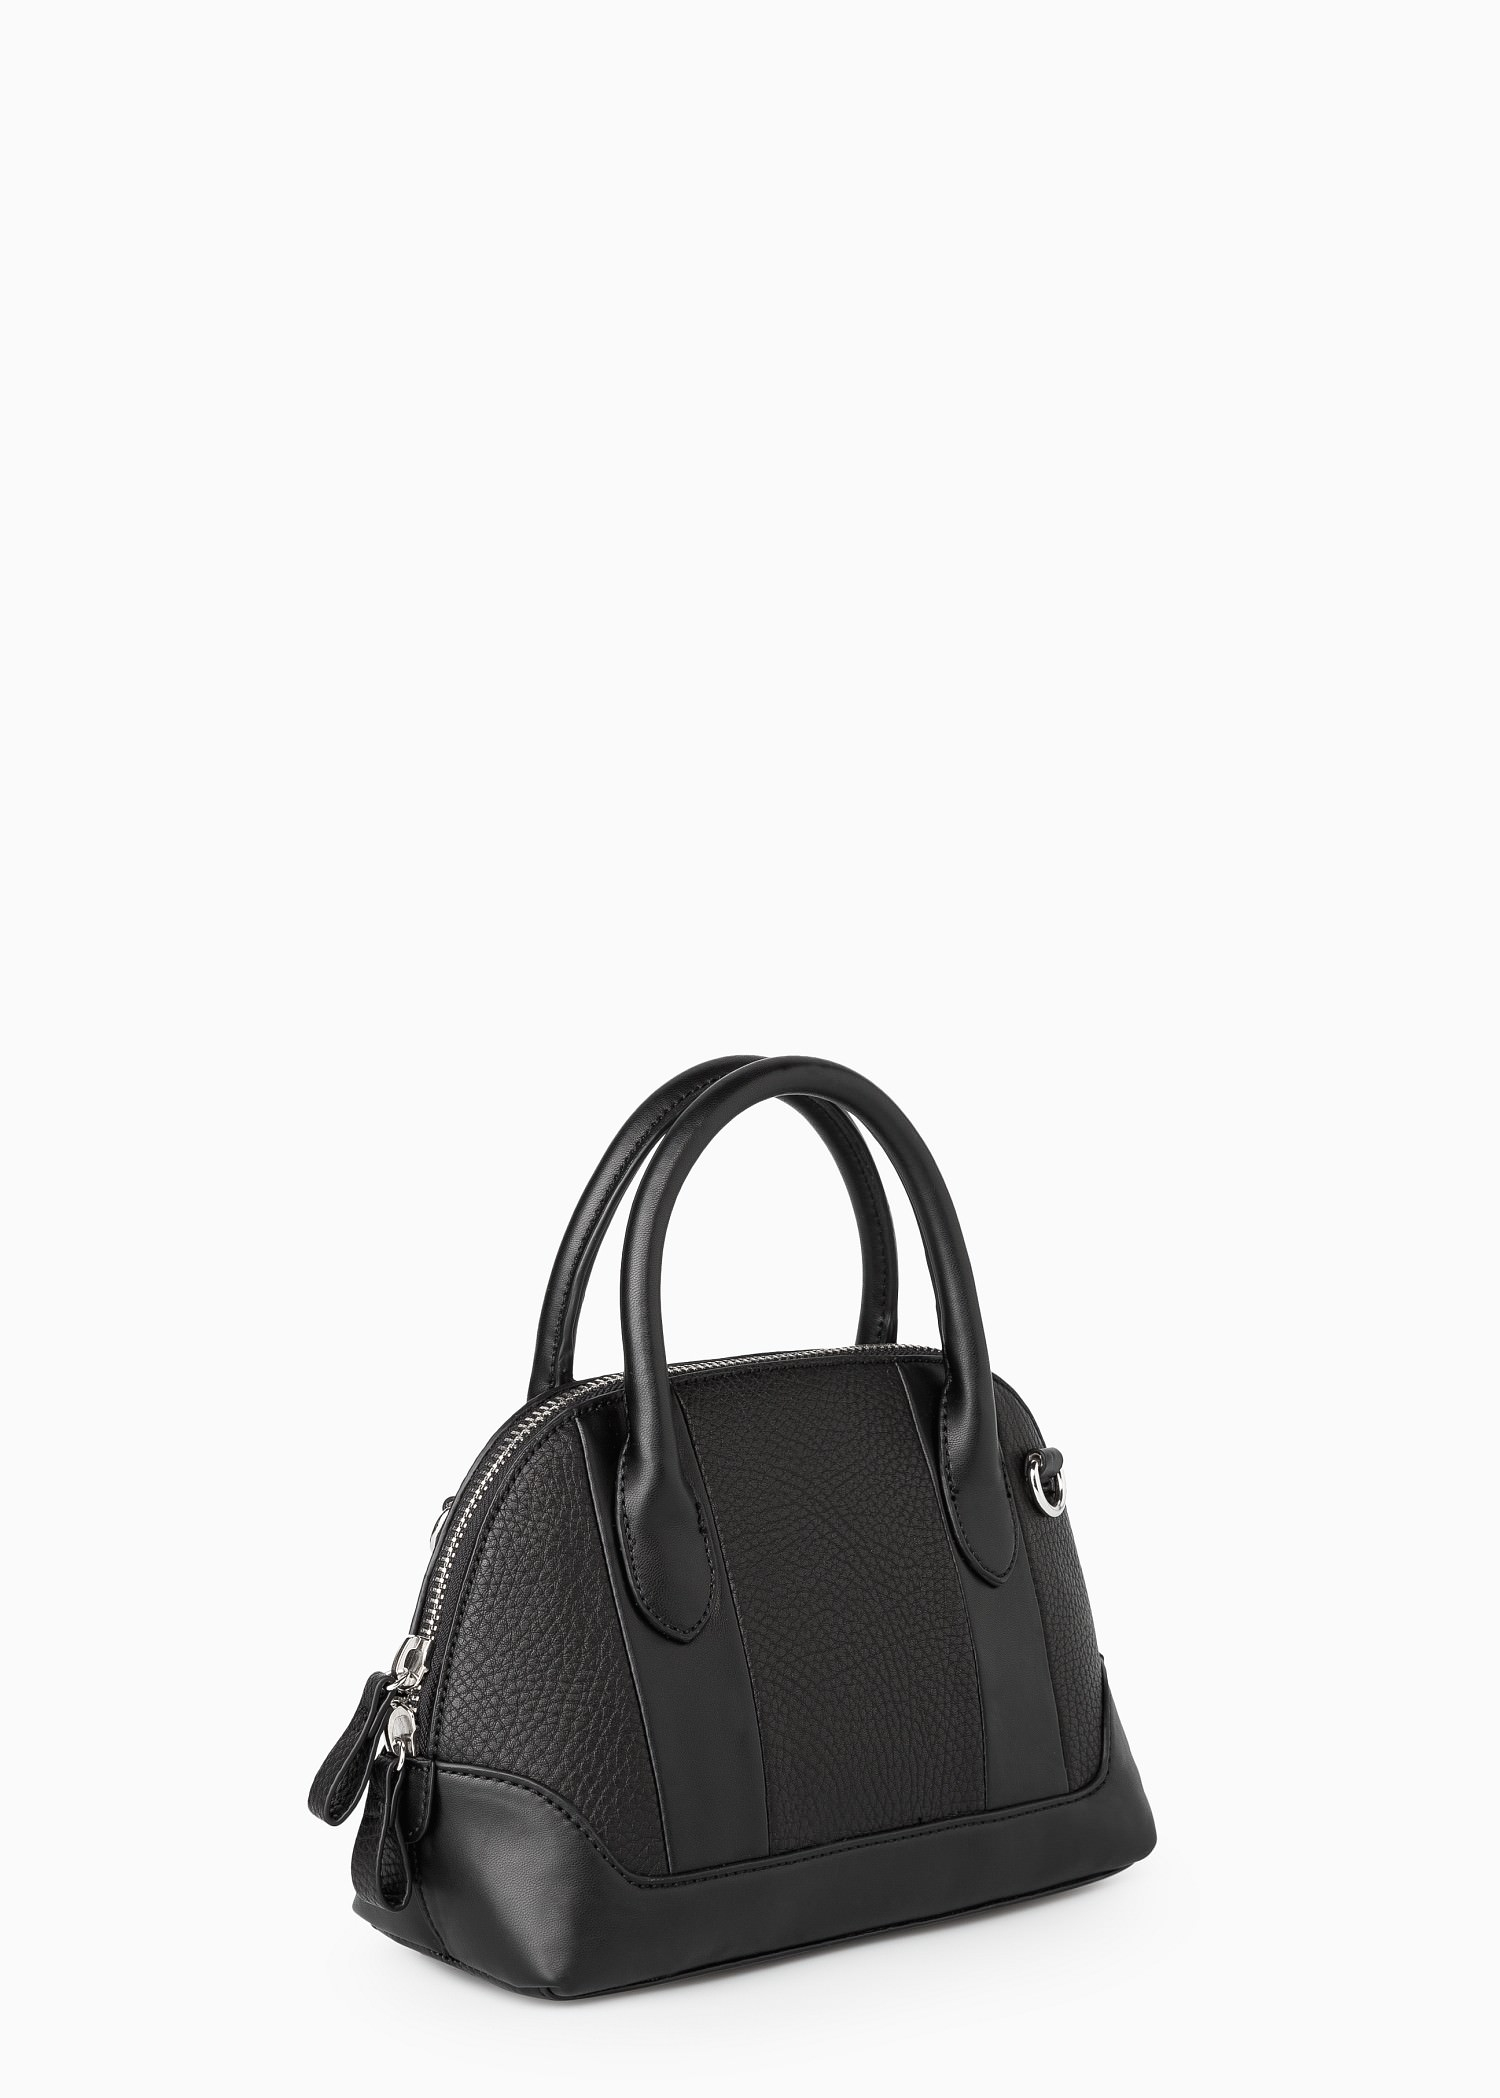 Mango Small Tote Bag in Black | Lyst